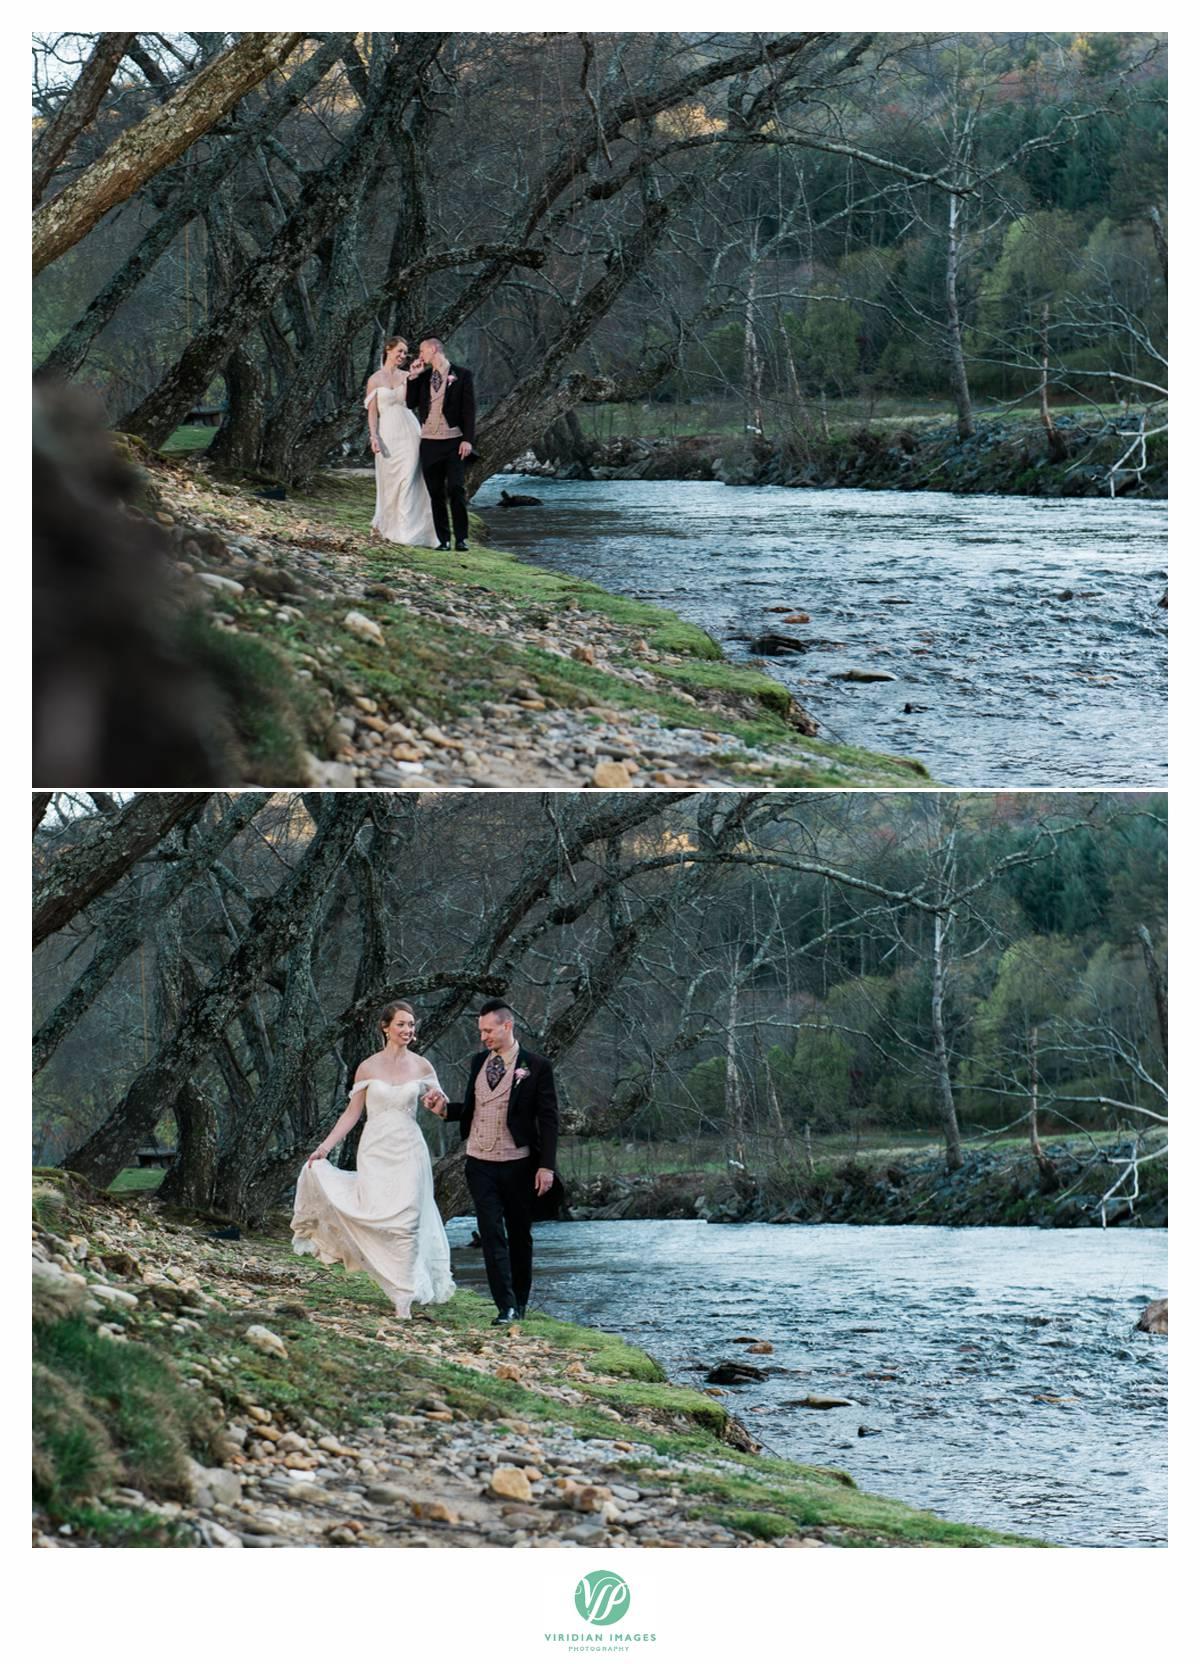 Retreat-at-Hiawassee-river-wedding-Viridian-Images-Photography 24